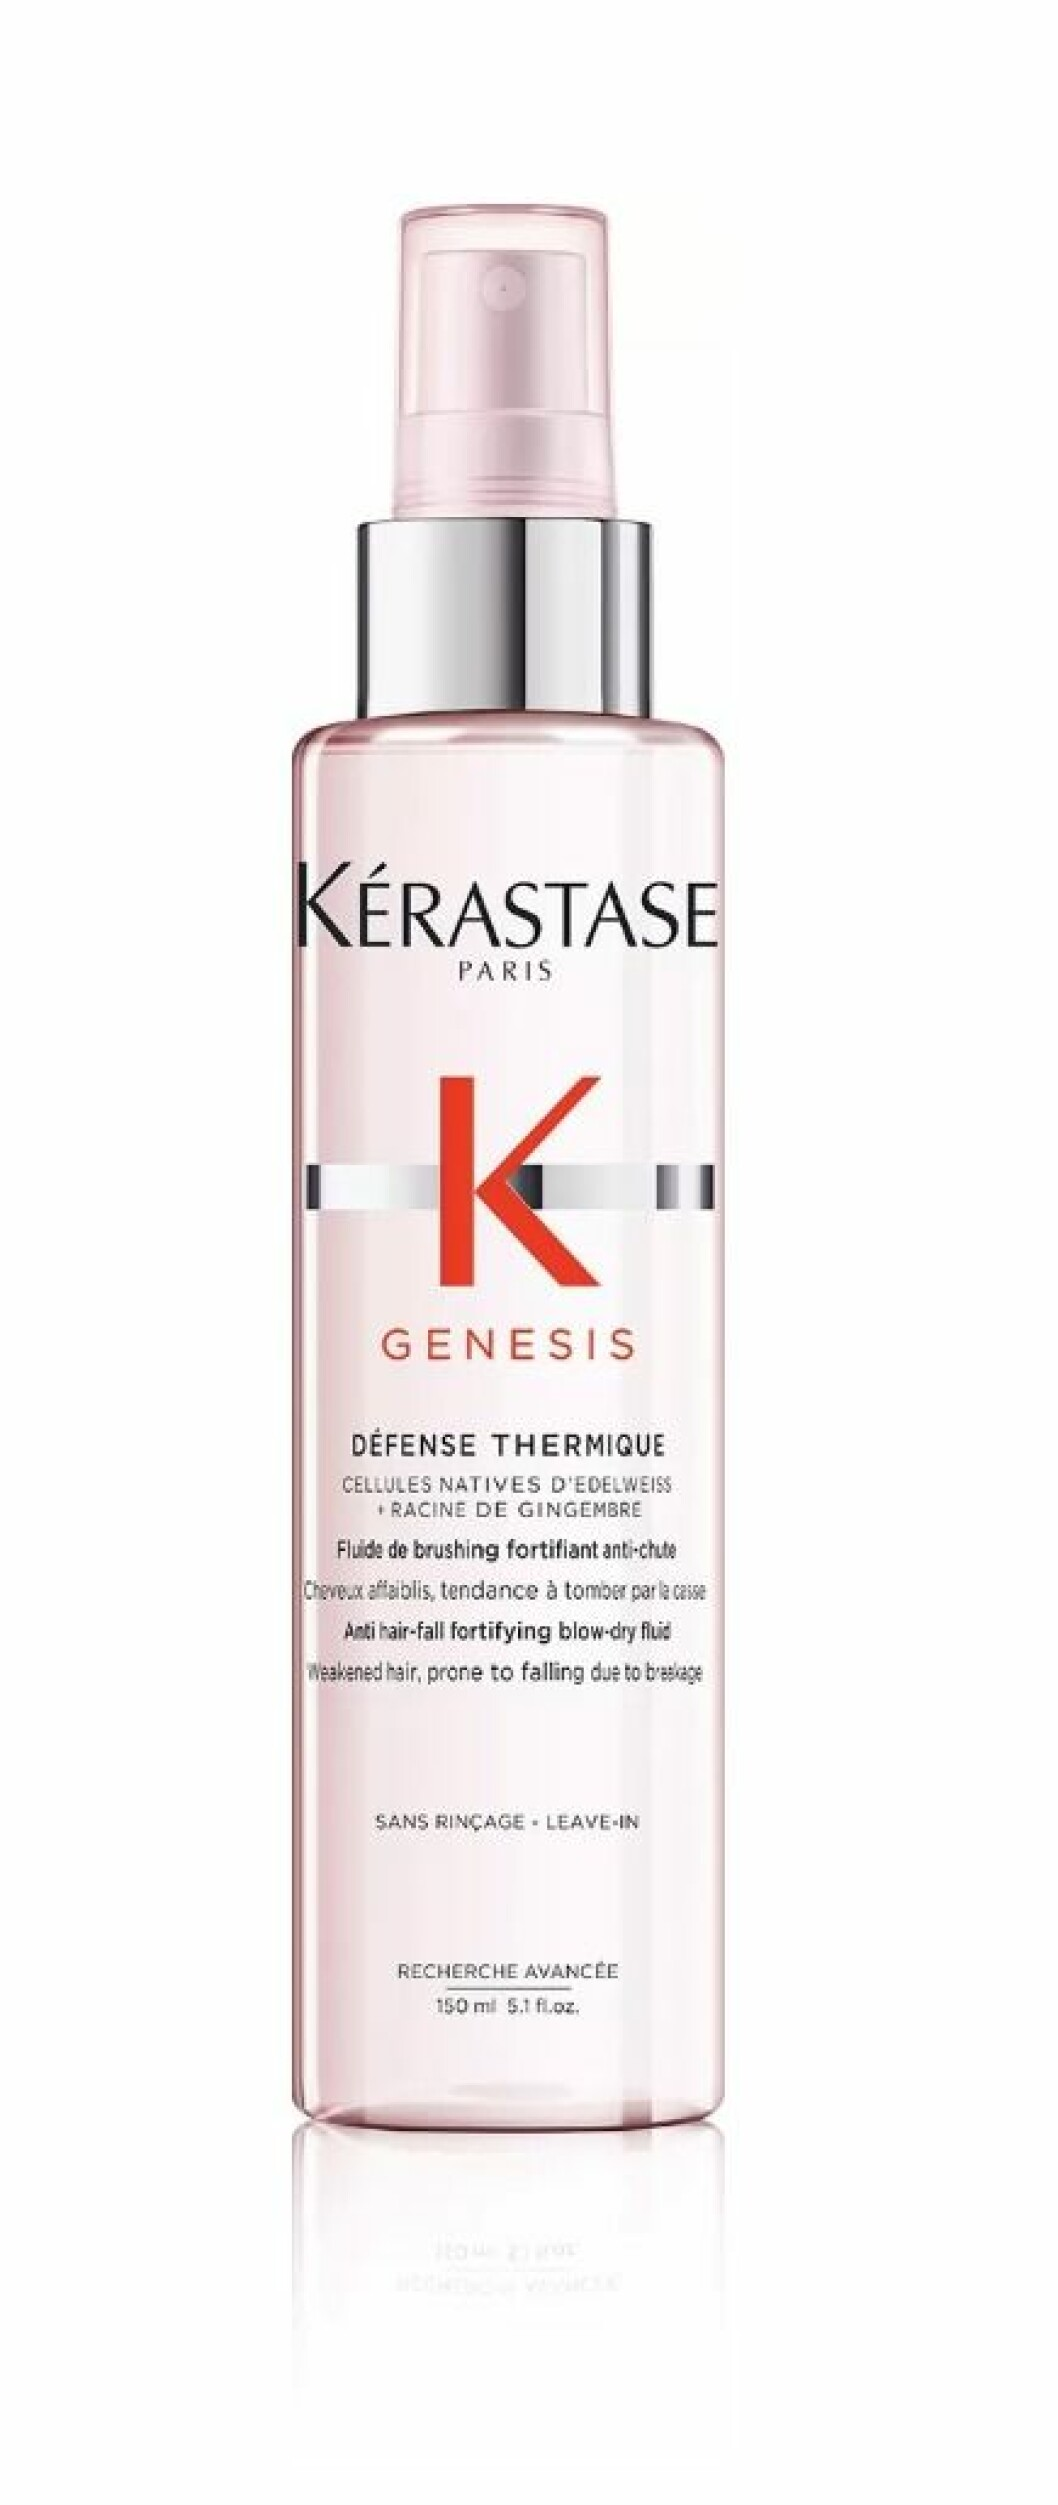 Hårmisten Genesis défense thermique frånKérastase.